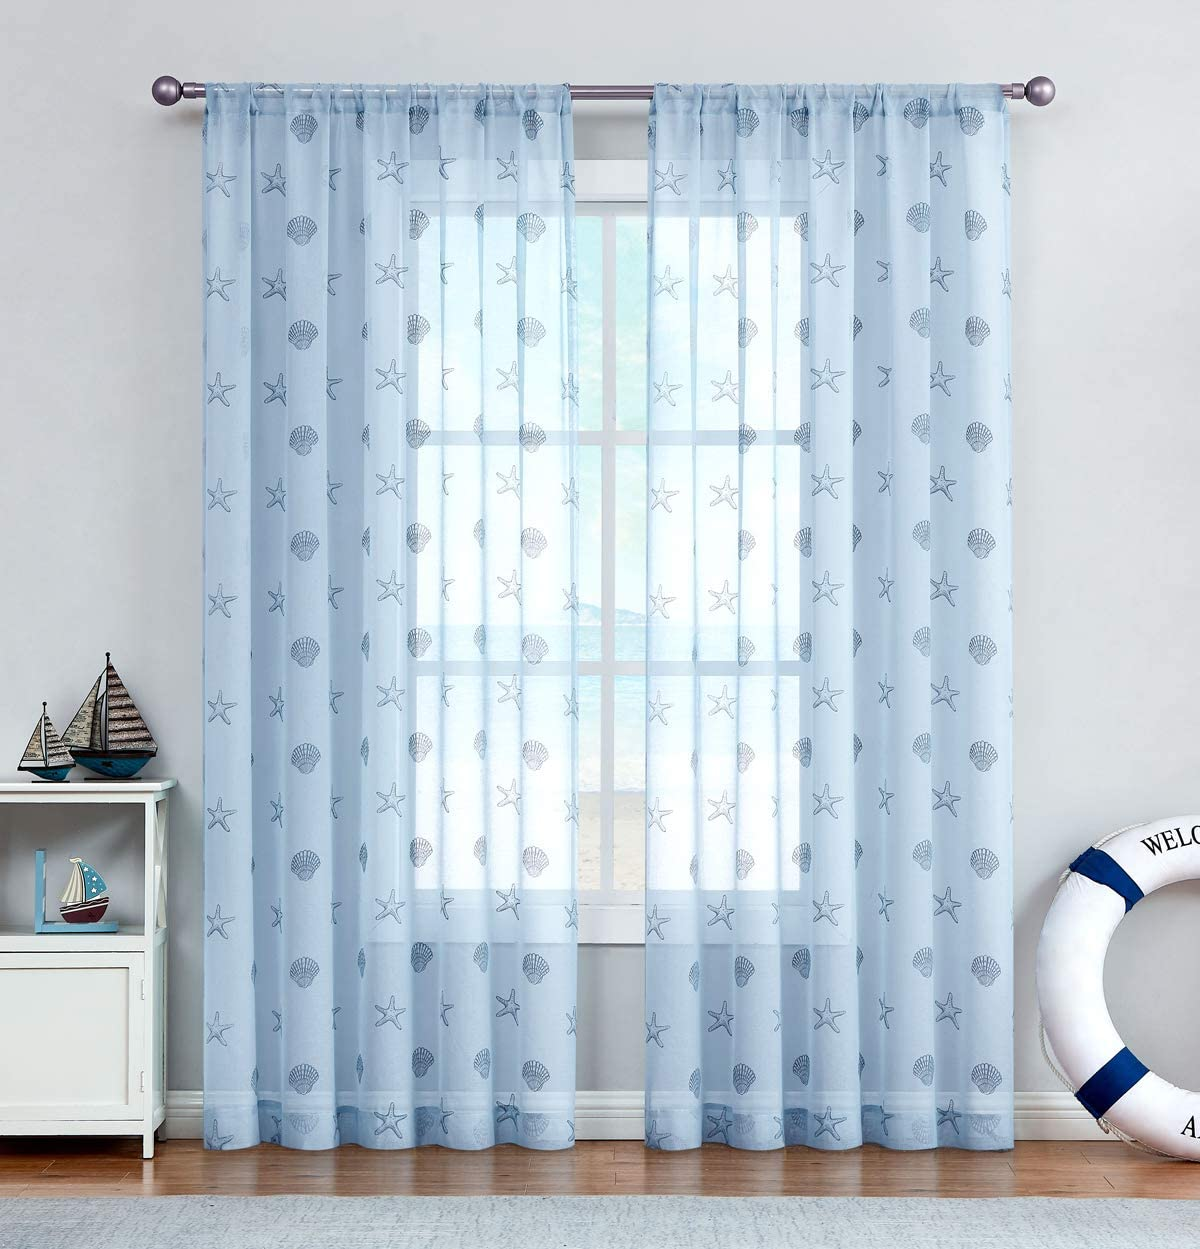 {Brand NEW} Valances Reef Seashells sheer Lace curtains White Panels